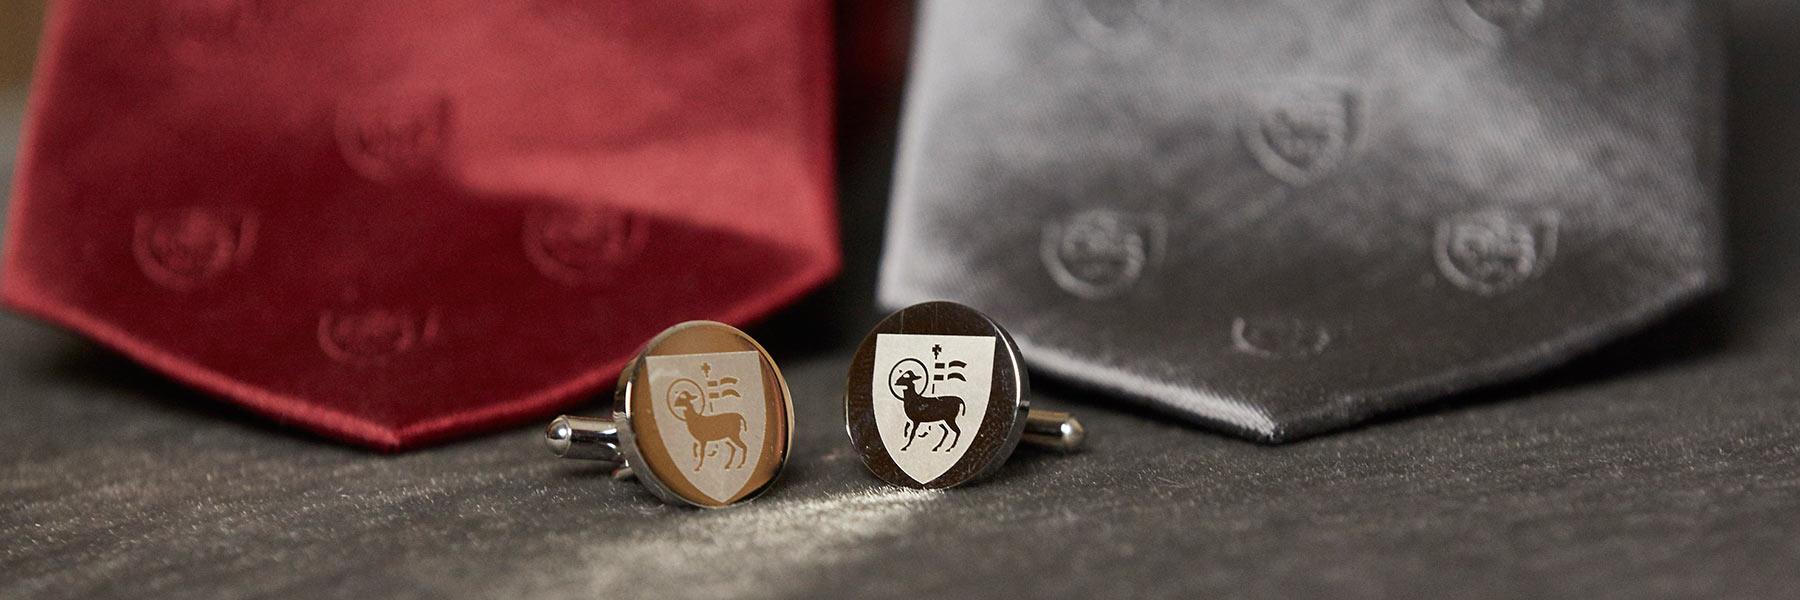 Bespoke Textiles ties and cufflinks